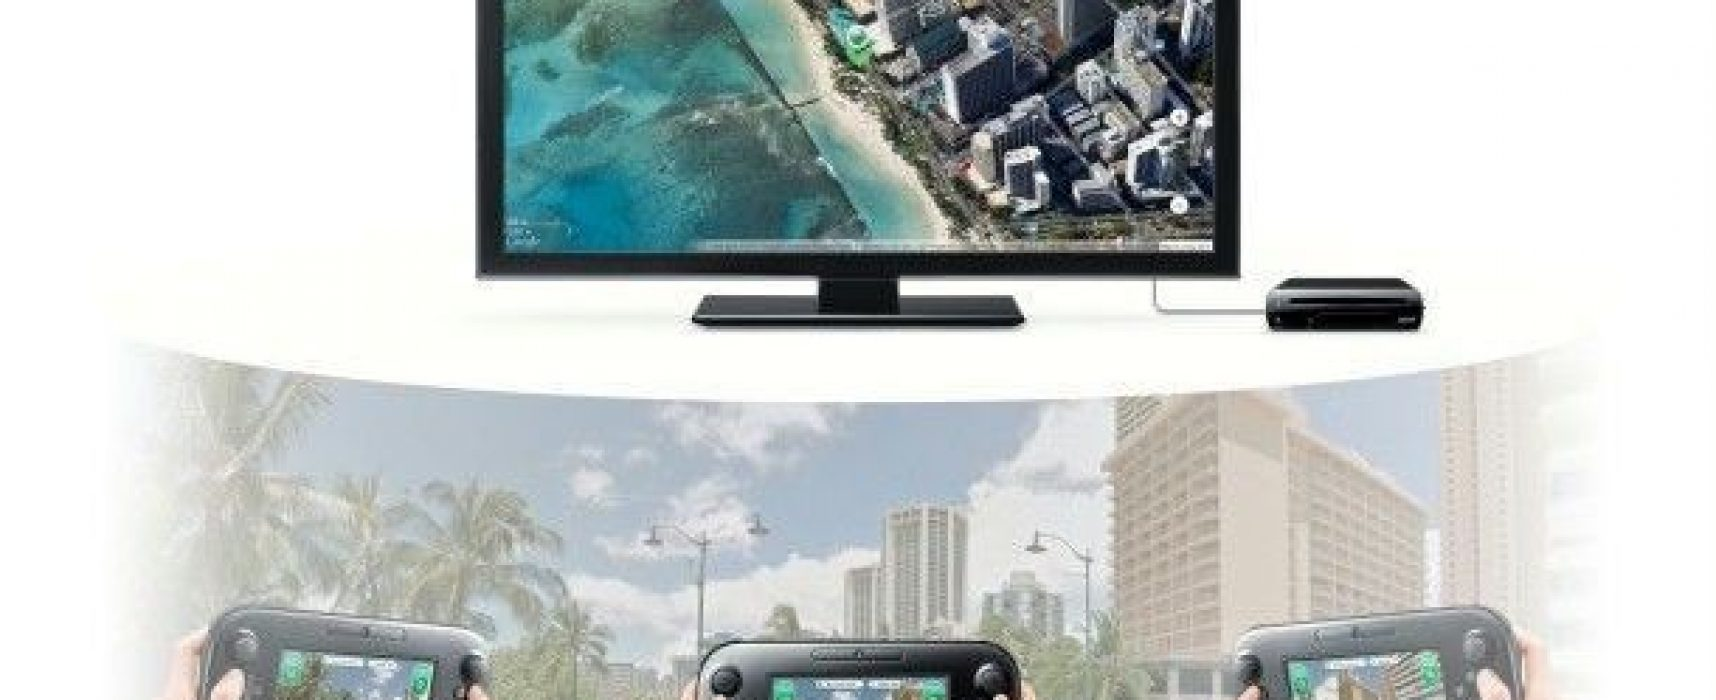 Nintendo anuncia la muerte de Wii U 10.11.16